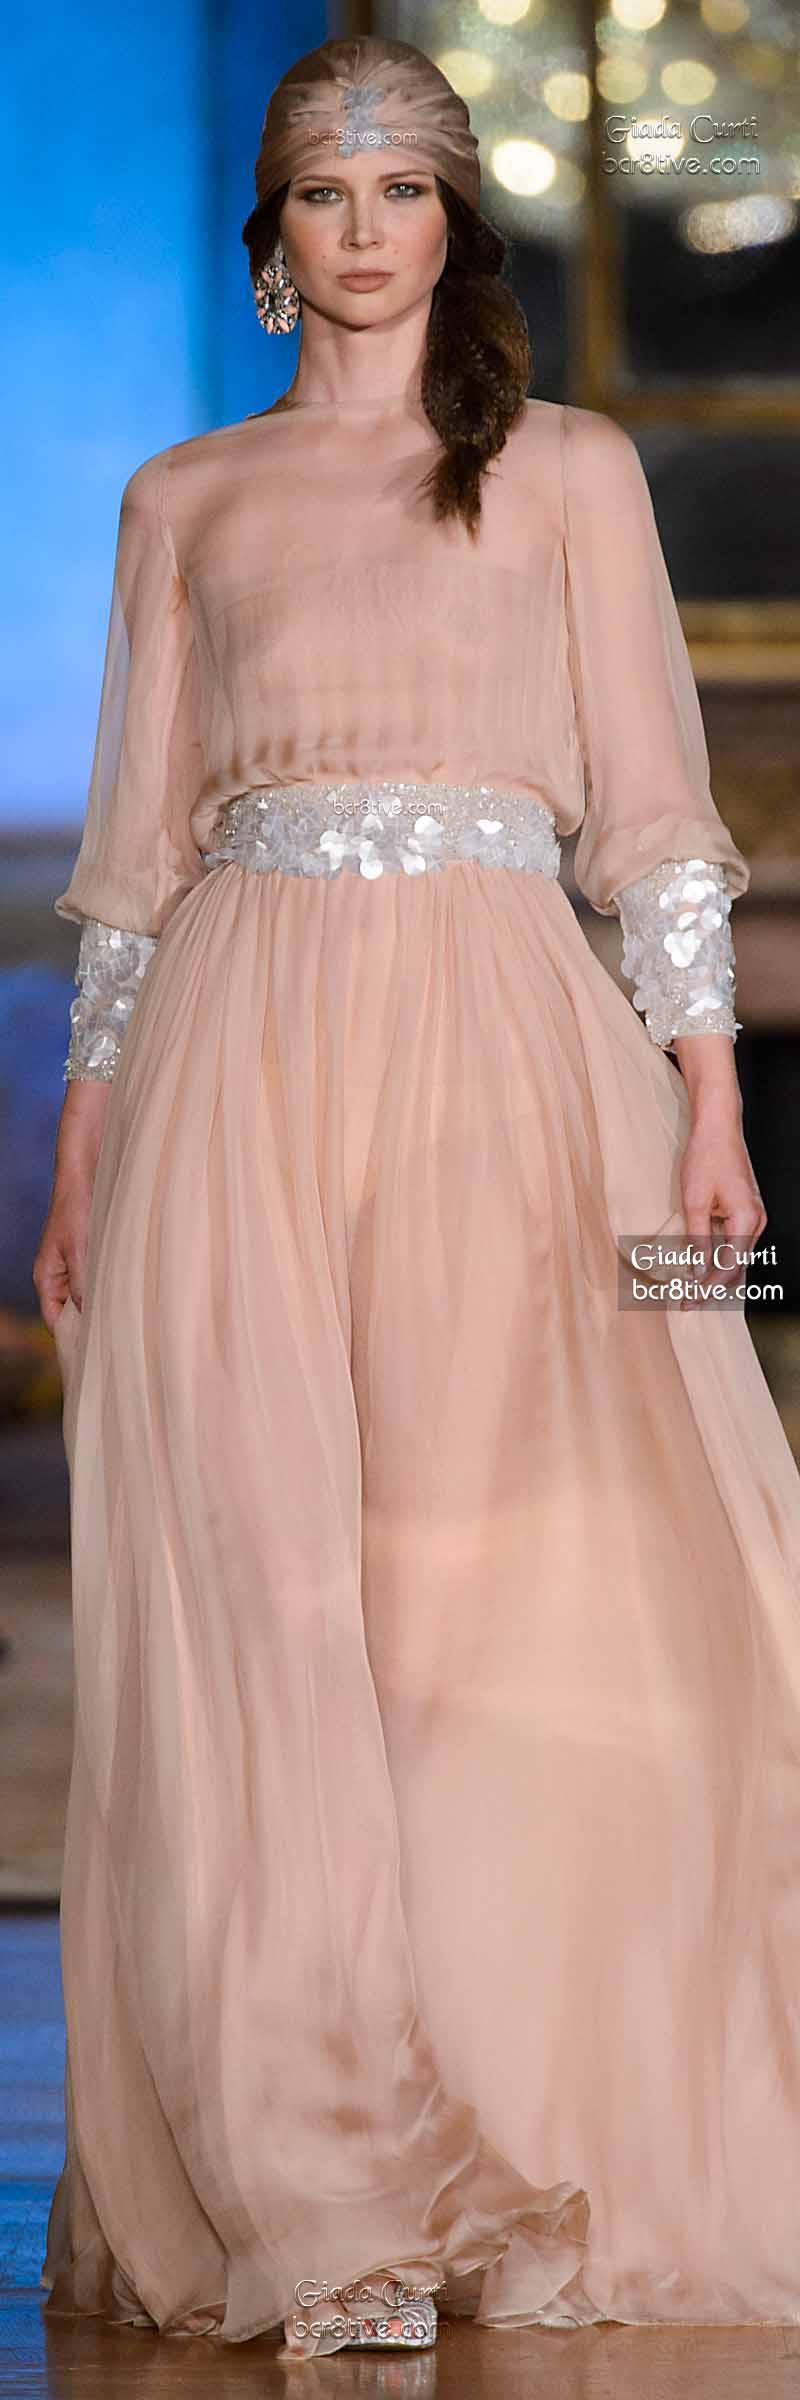 Giada Curti Shukran Haute Couture Collection